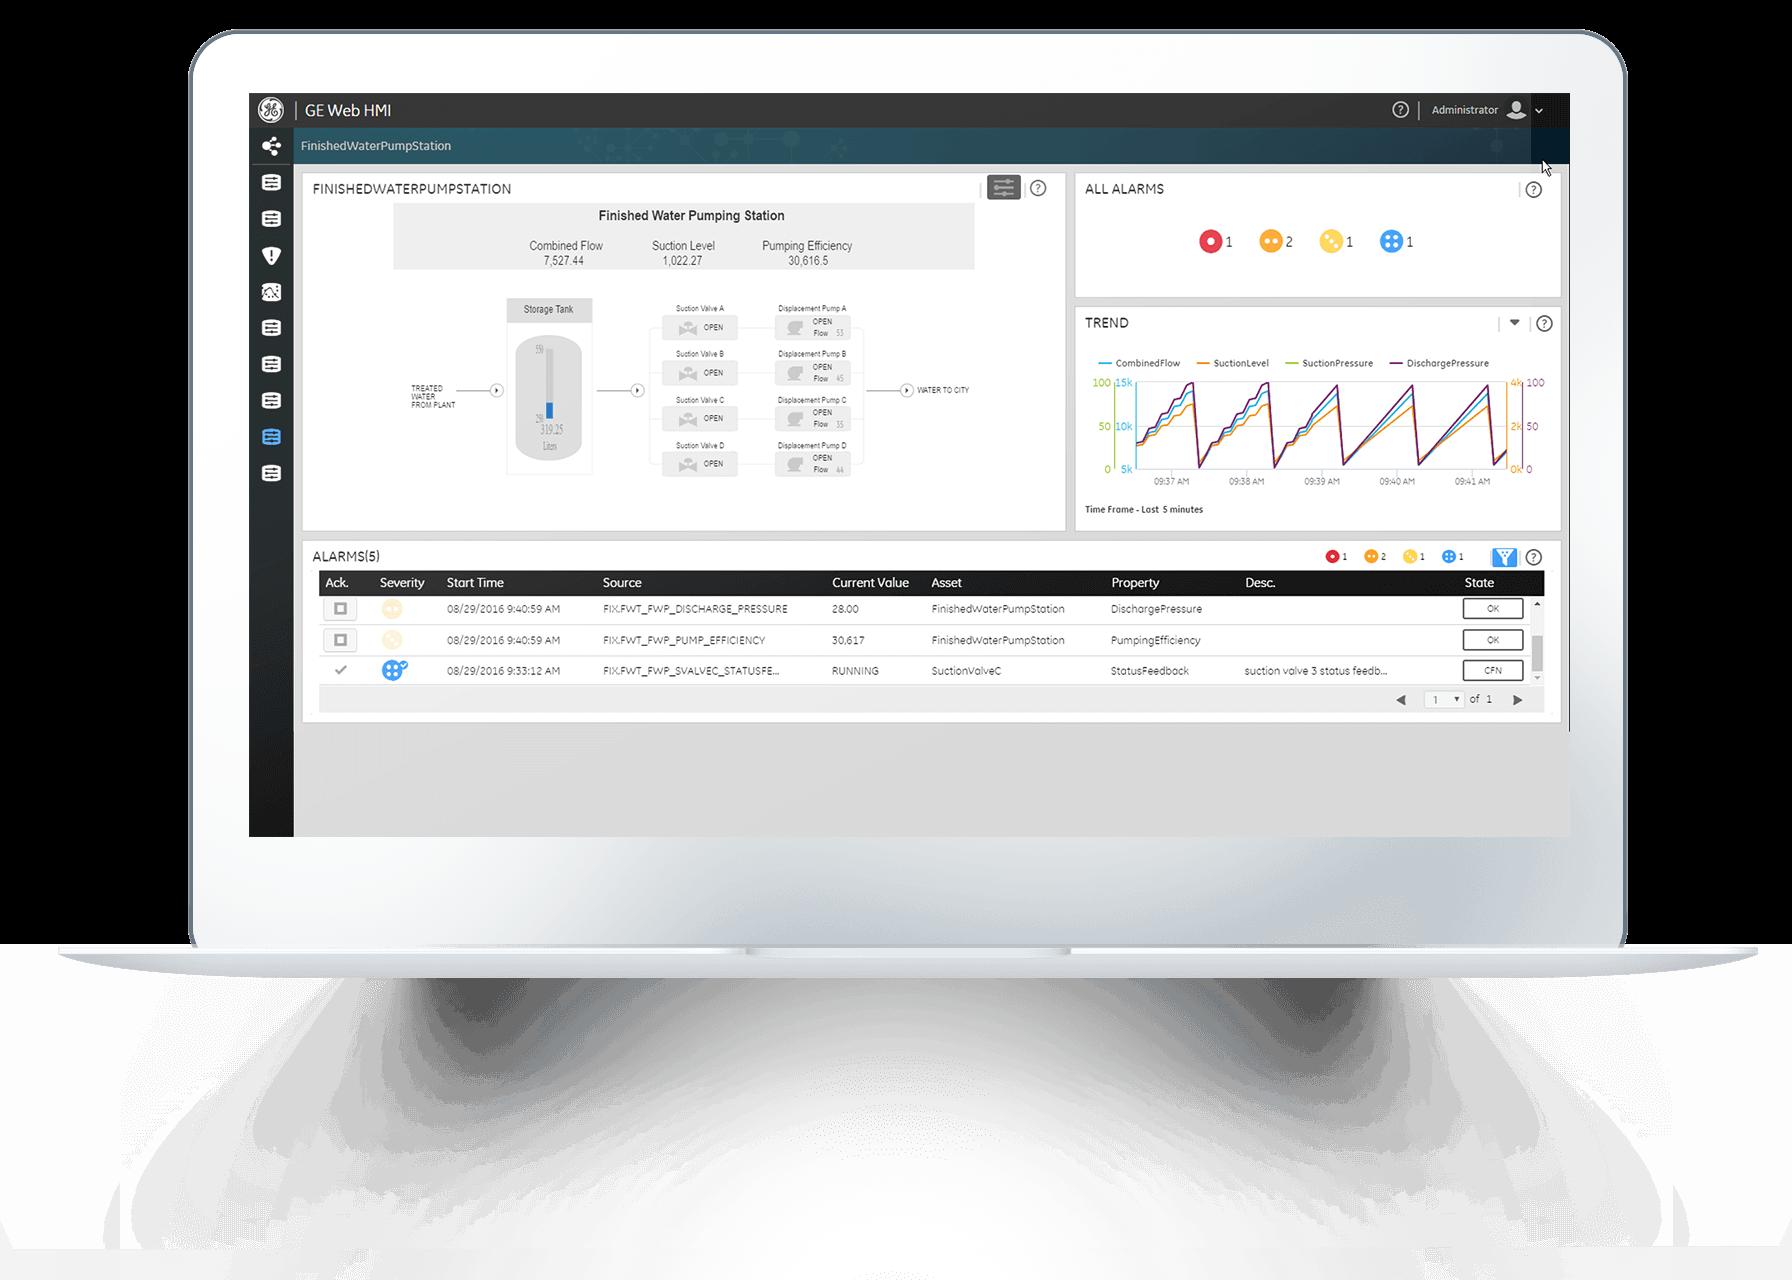 HMI-SCADA-Web-HMI-screenshot-1792x1280-LAPTOP.png